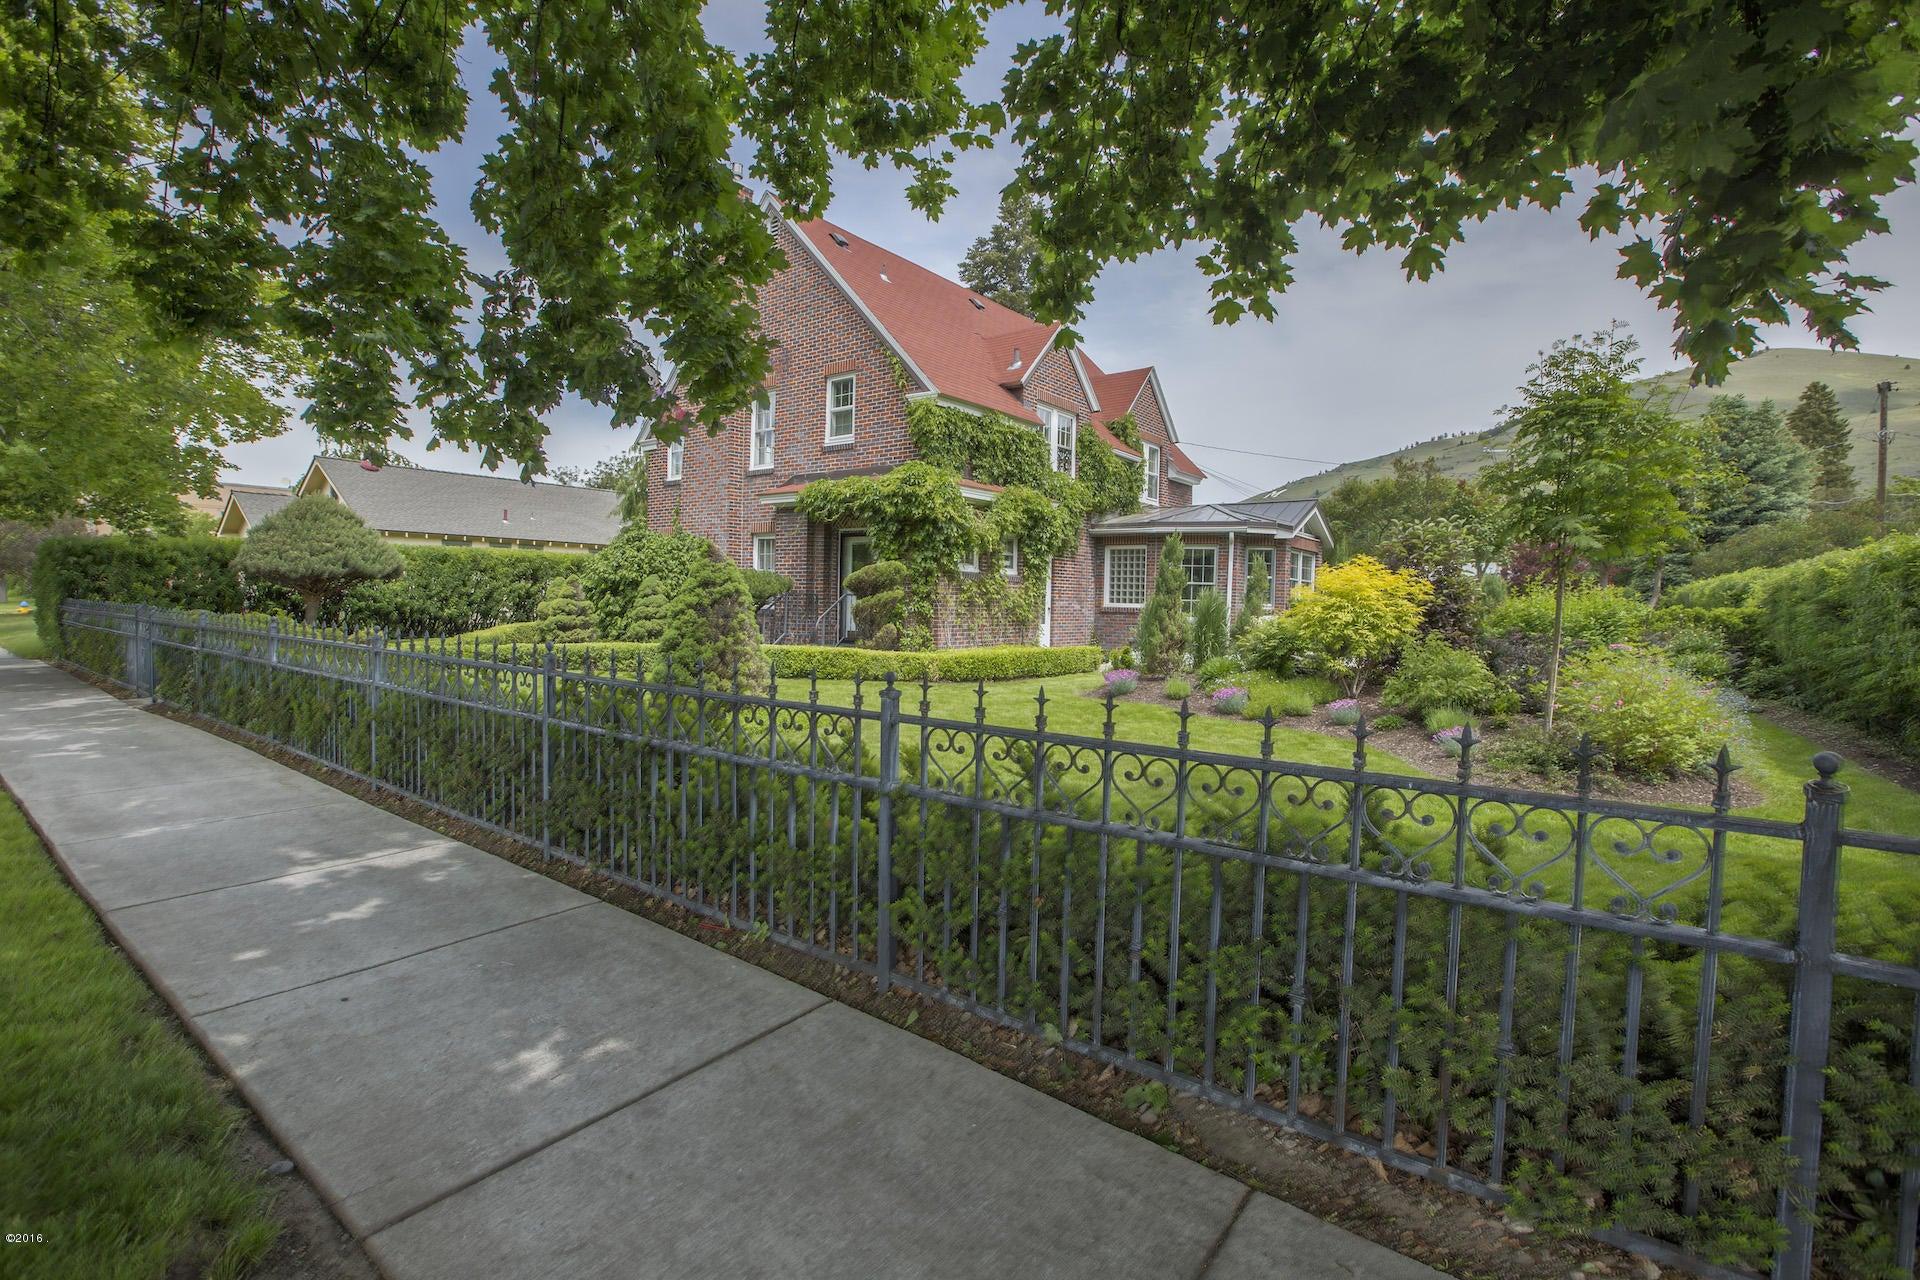 Single Family Home for Sale at 1730 South Higgins Avenue Missoula, Montana 59801 United States